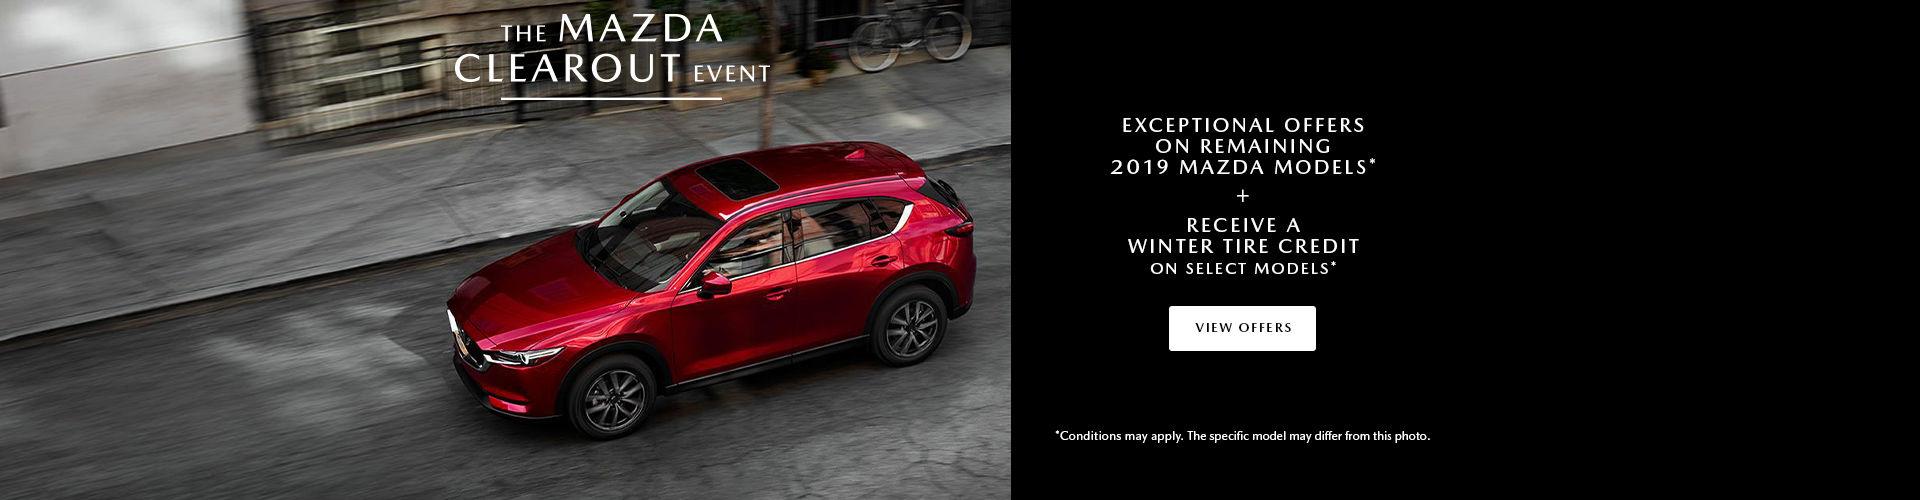 Clearout Mazda Event